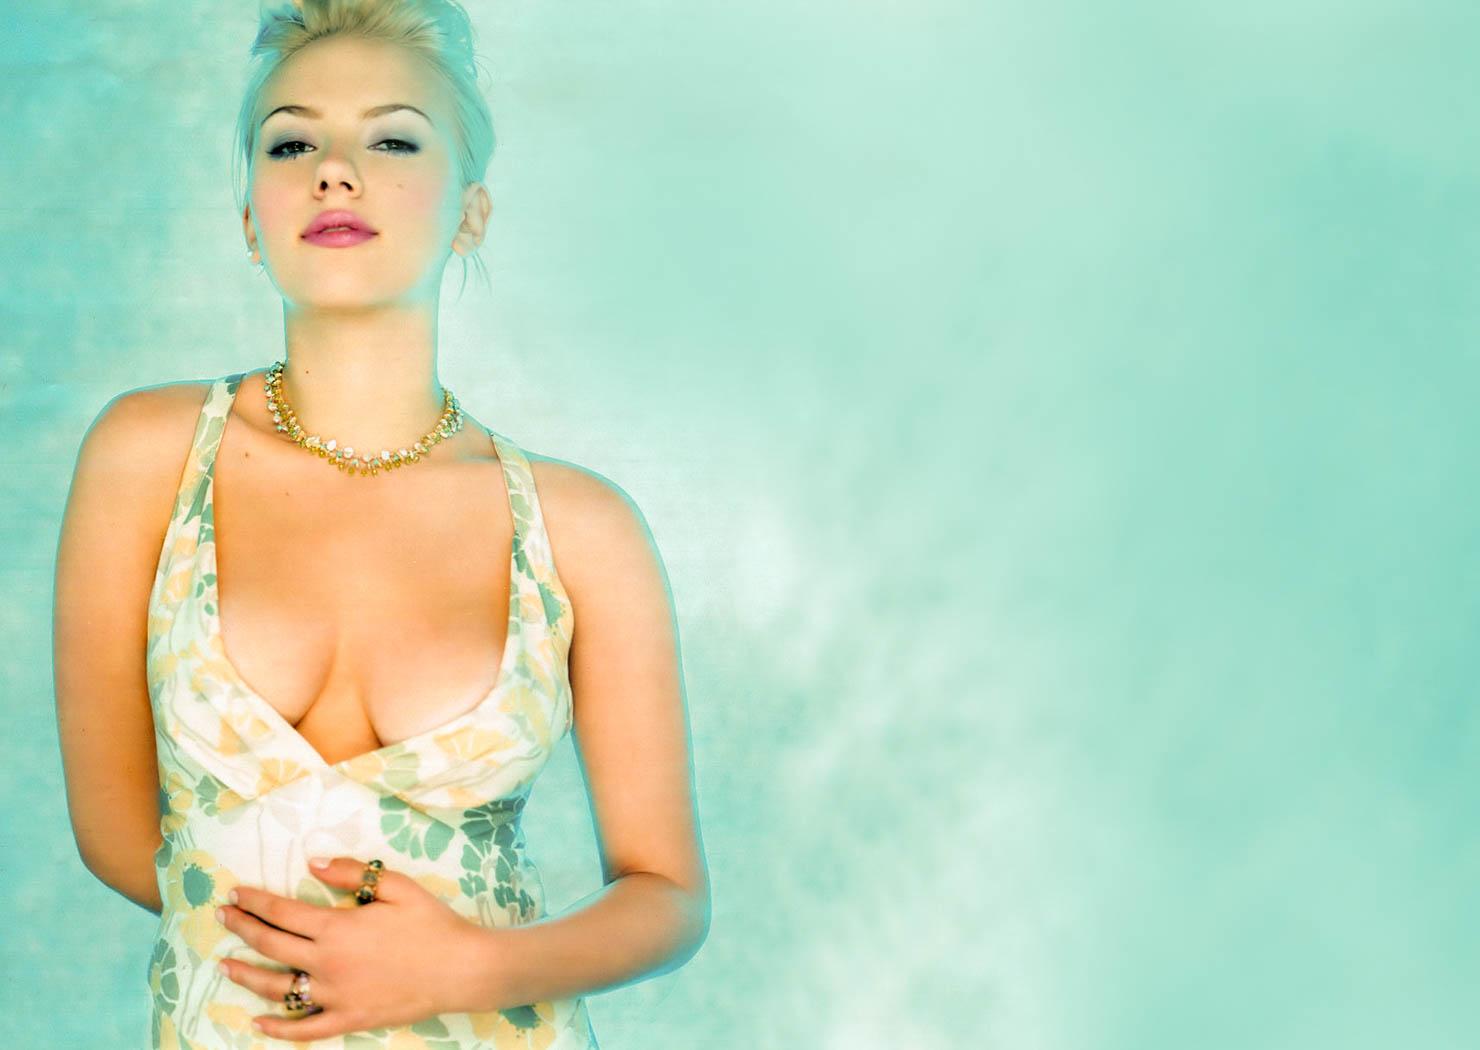 Scarlett Johansson Wallpapers 2019 1480x1050